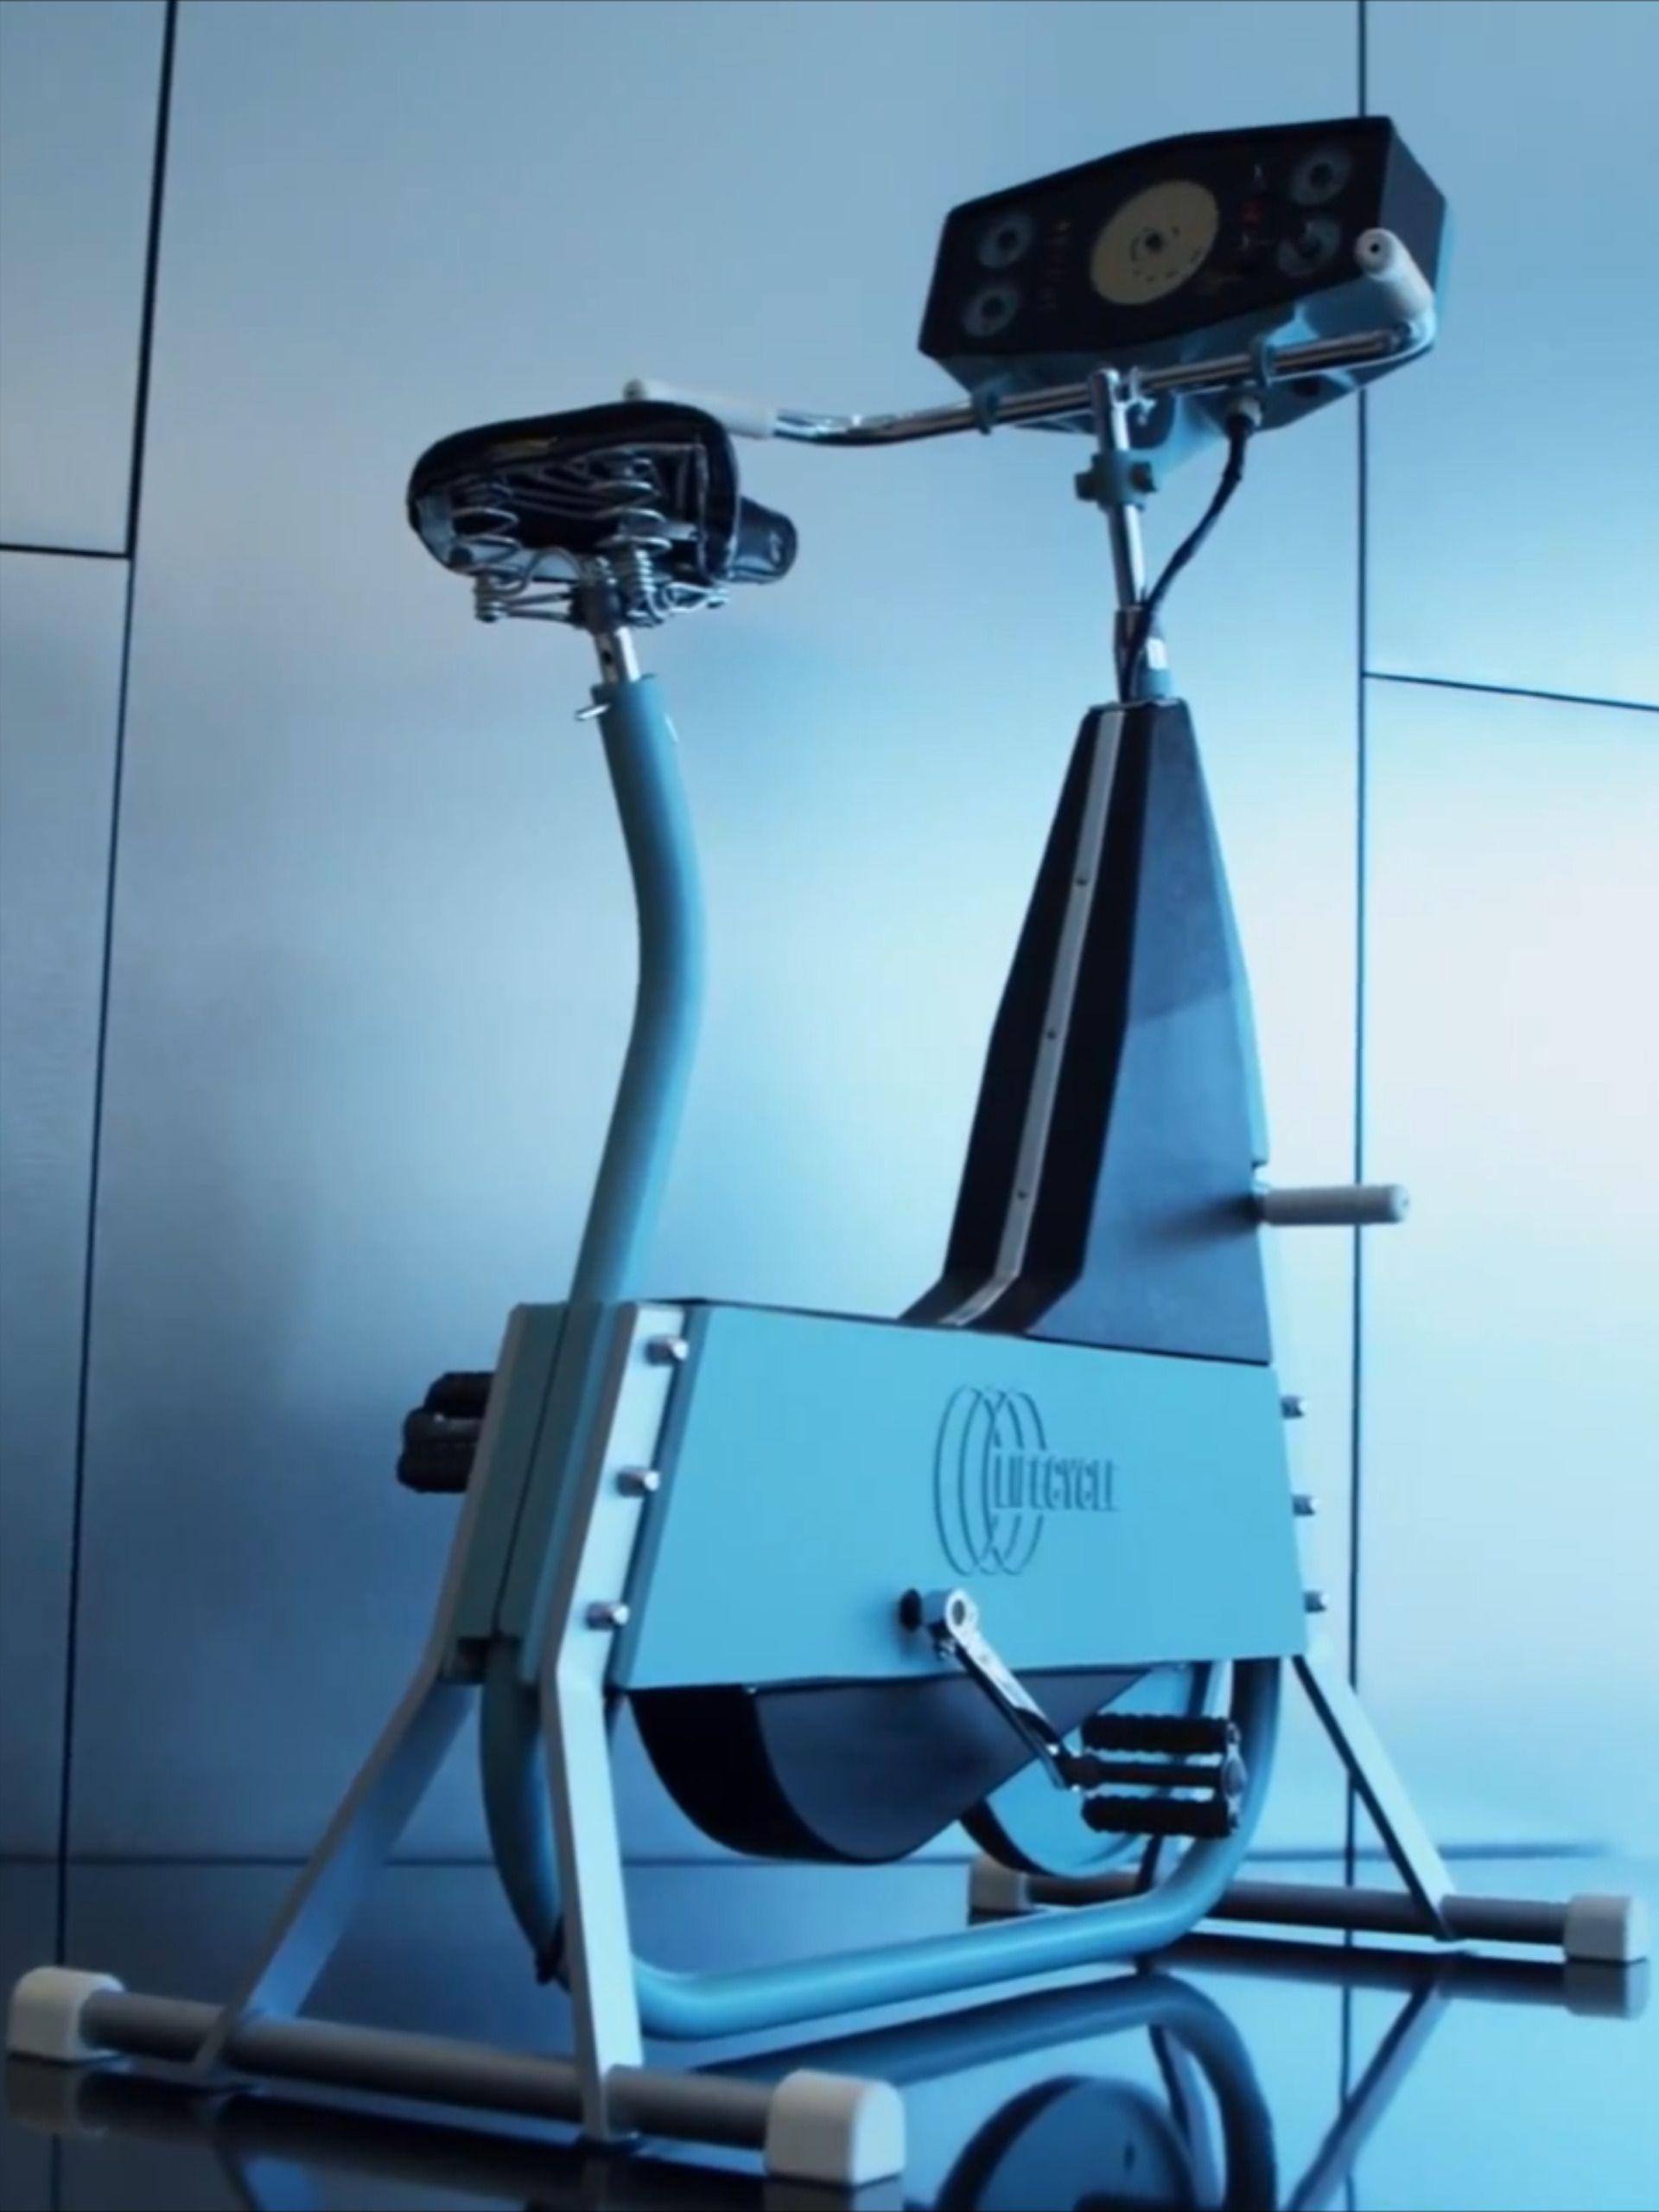 Craigslist Exercise Equipment Biking Workout No Equipment Workout Exercise Bikes